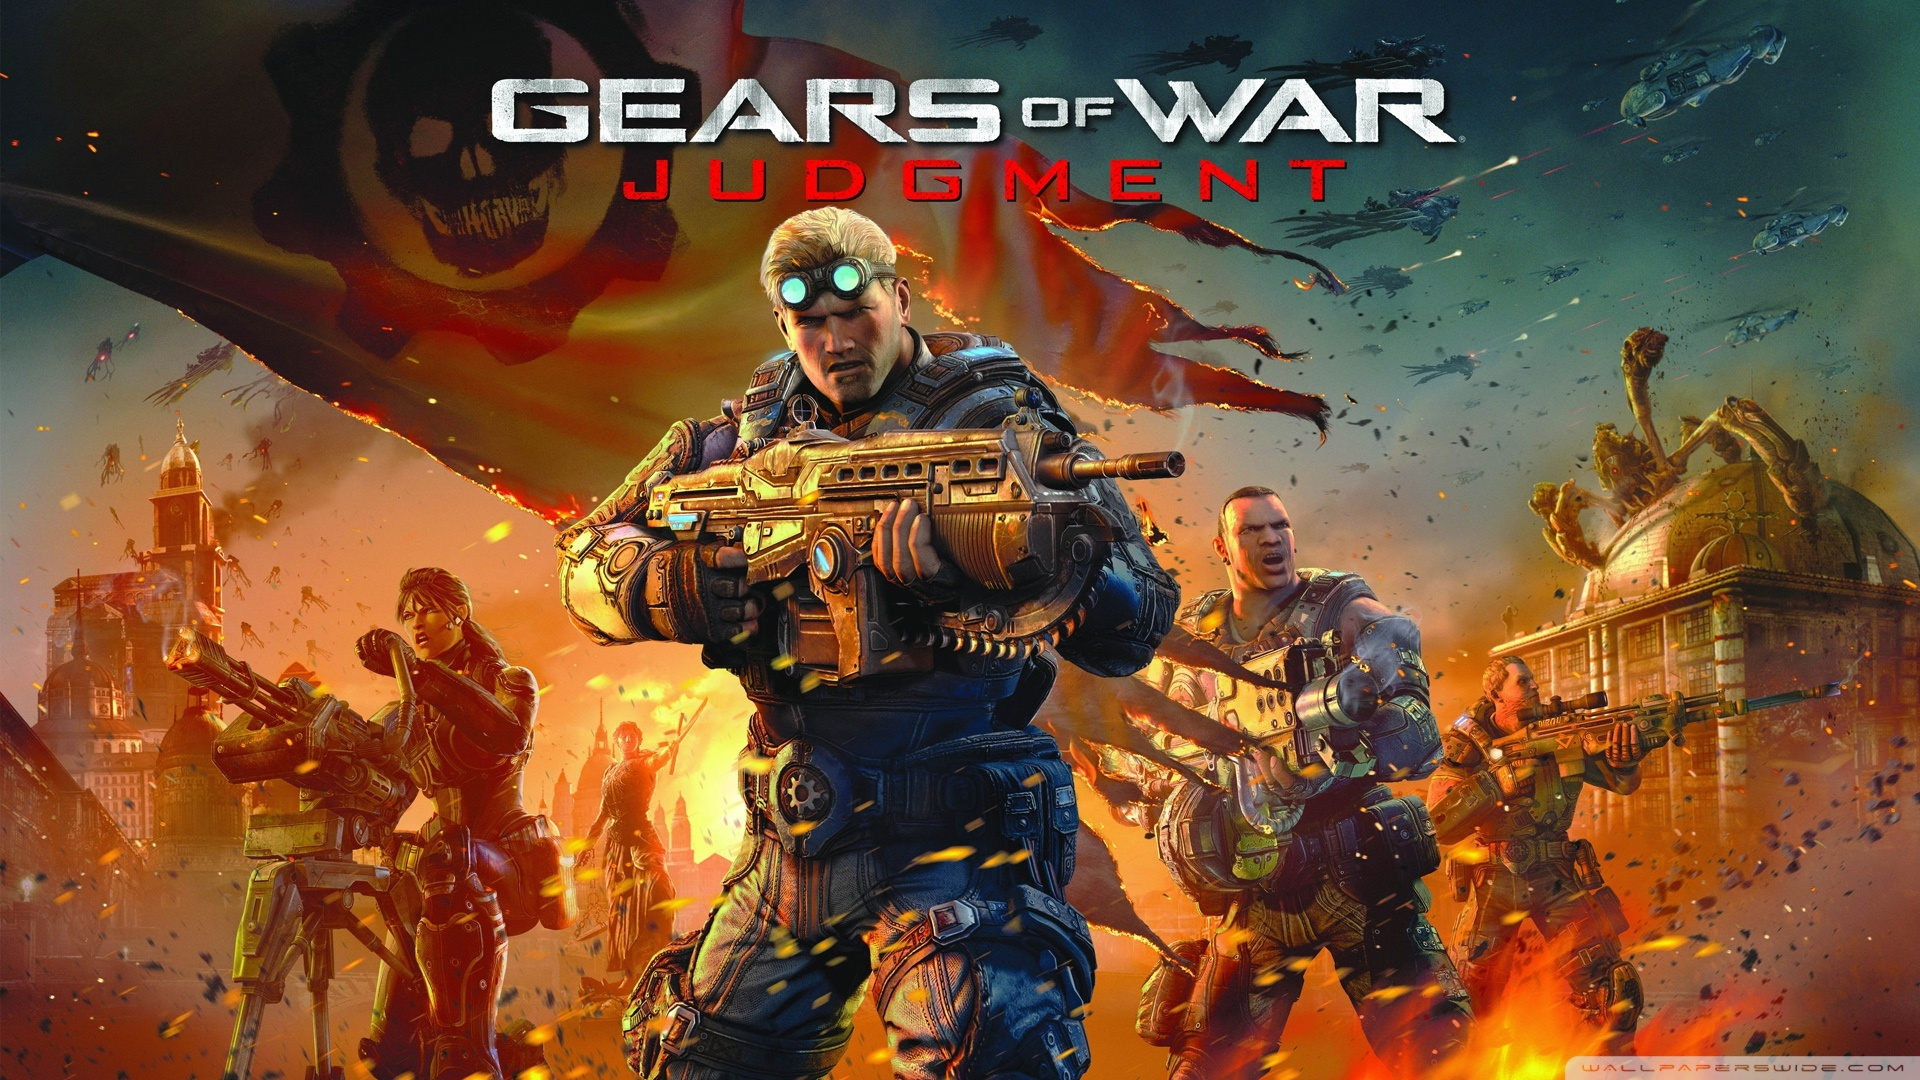 Gears of war judgment clipart.